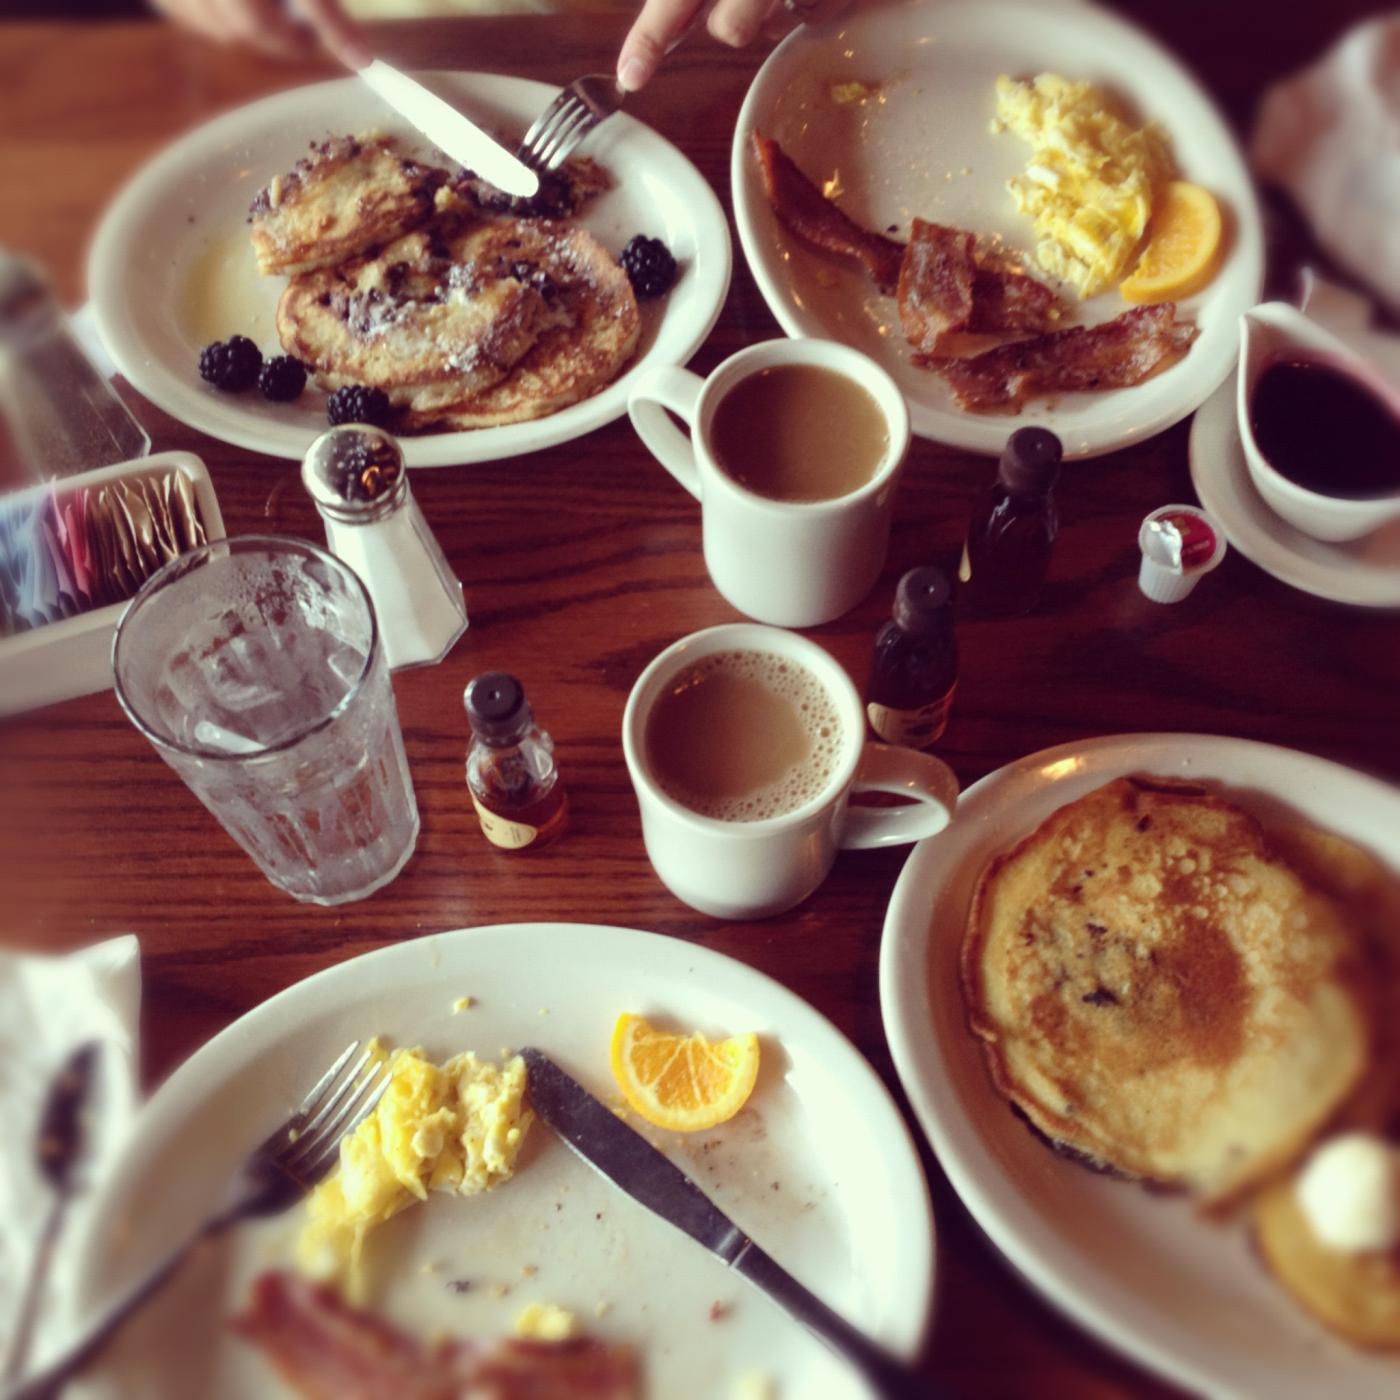 Breakfast on the road